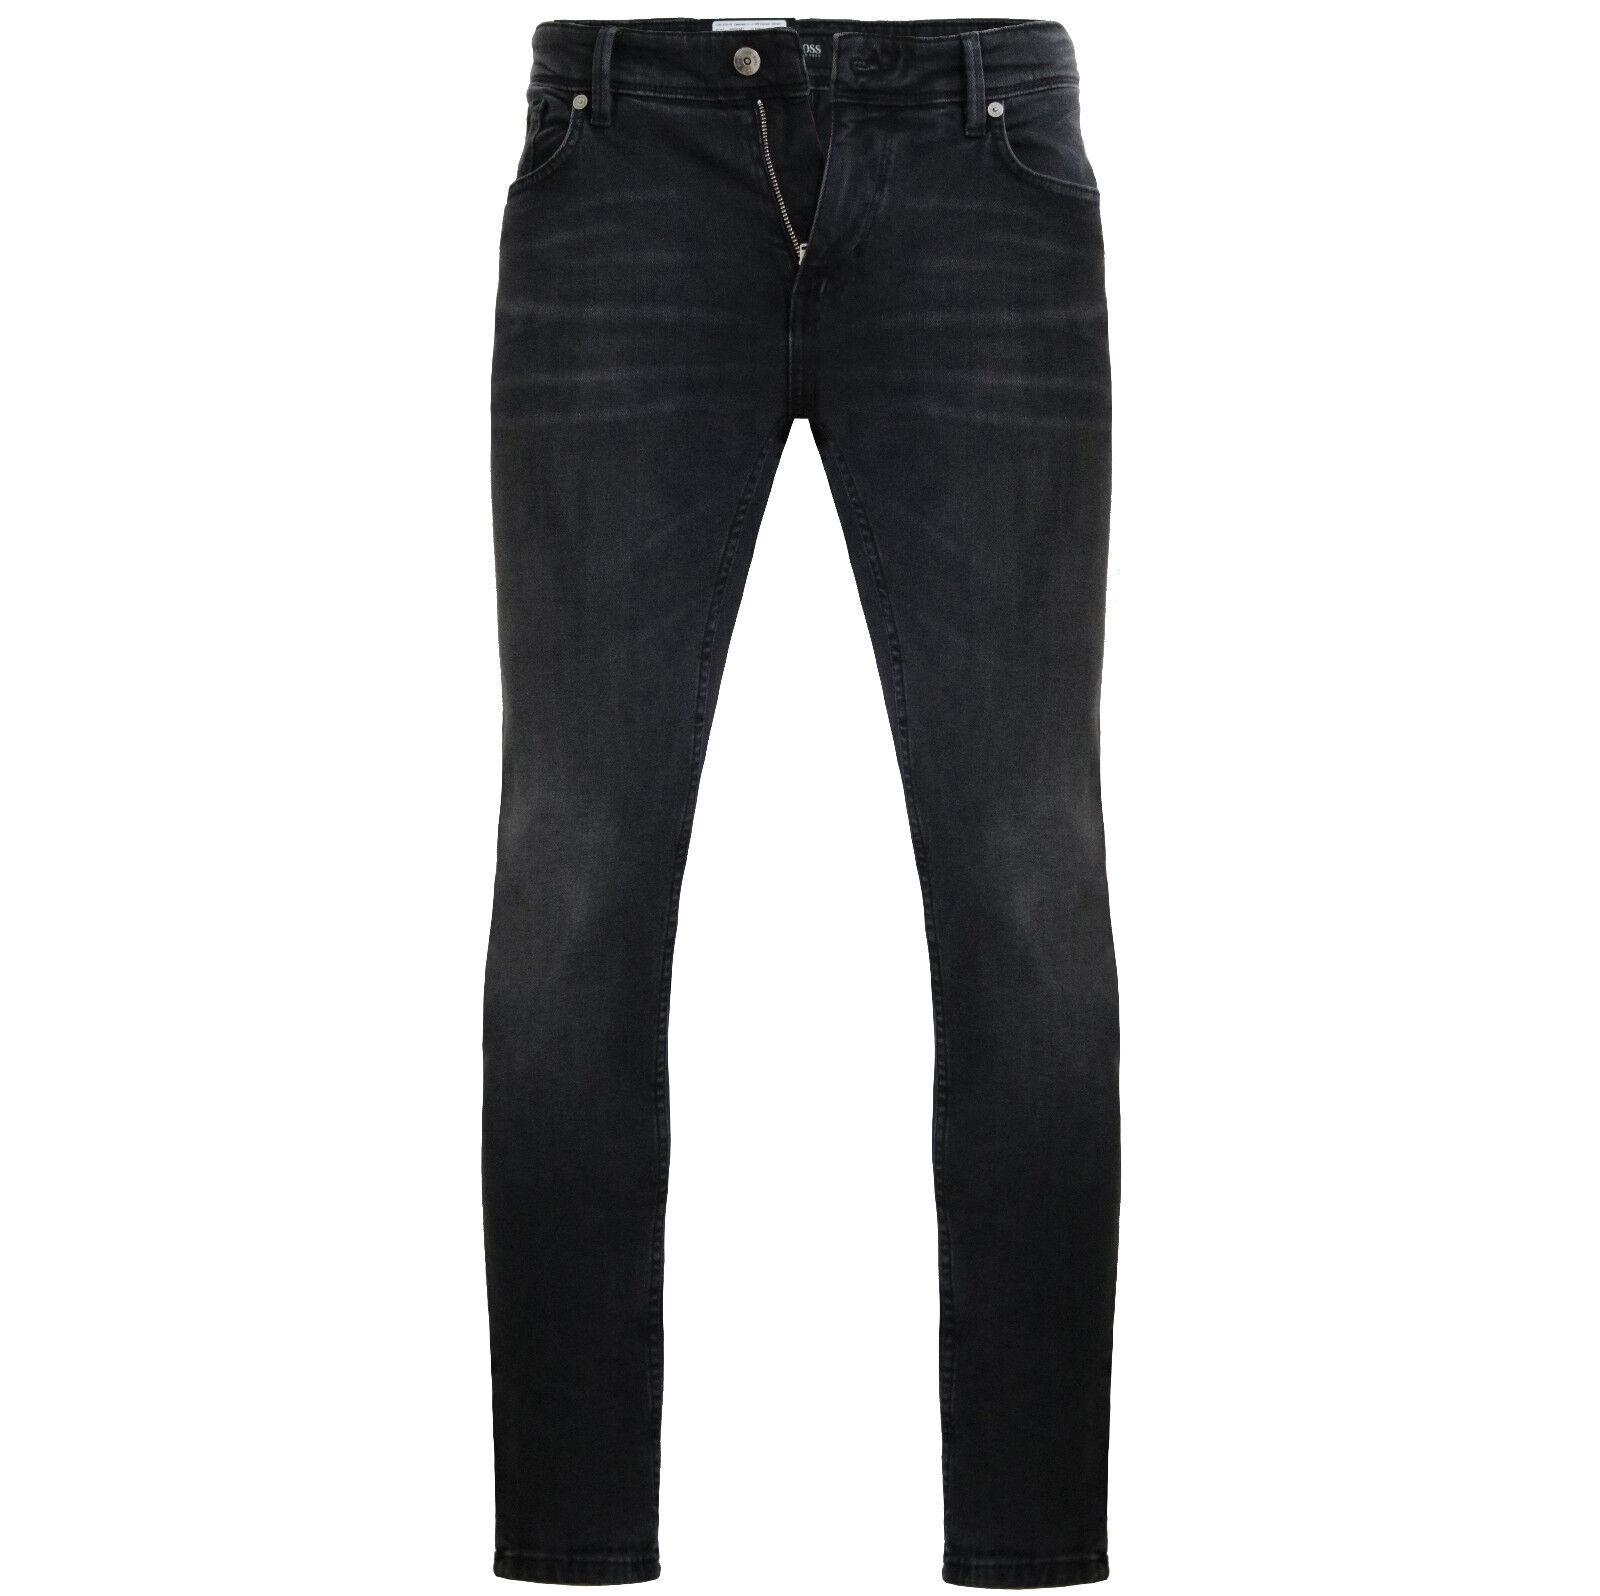 HUGO BOSS Hose Jeans  CHARLESTON3 W34 L32  NEU  SLIM FIT STRETCH